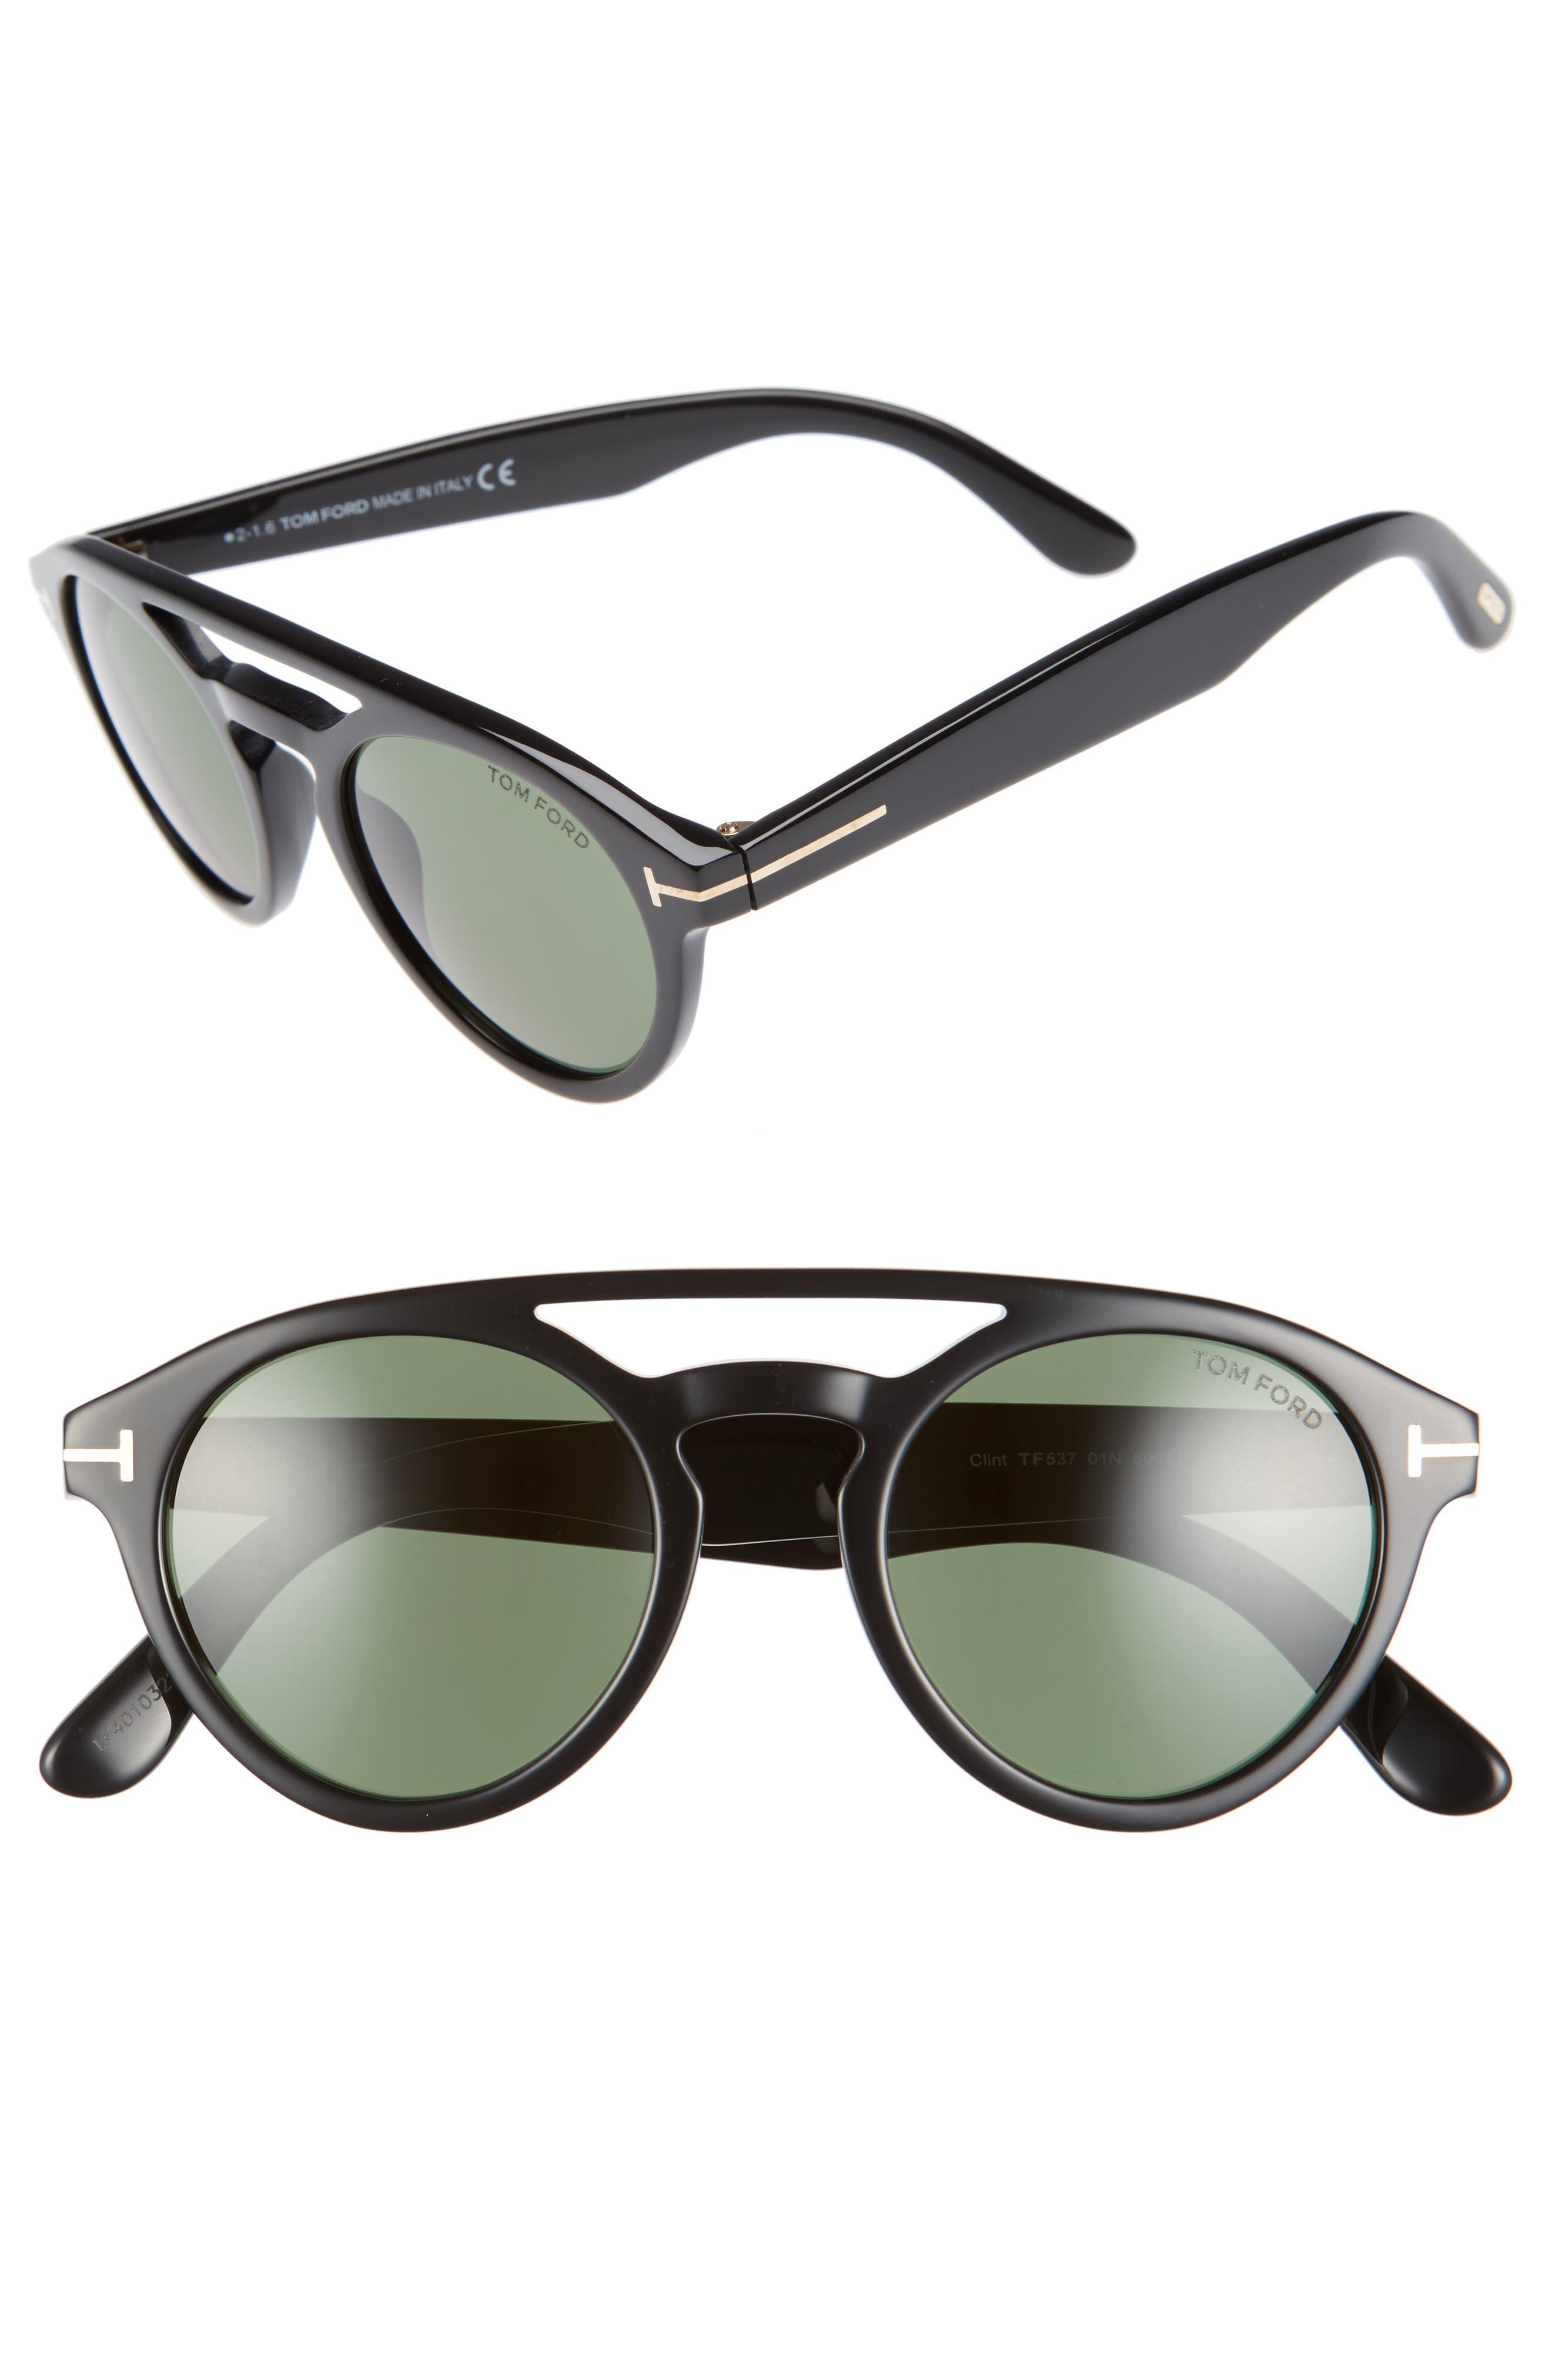 Alternate Image 1 Selected - Tom Ford Clint 50mm Aviator Sunglasses